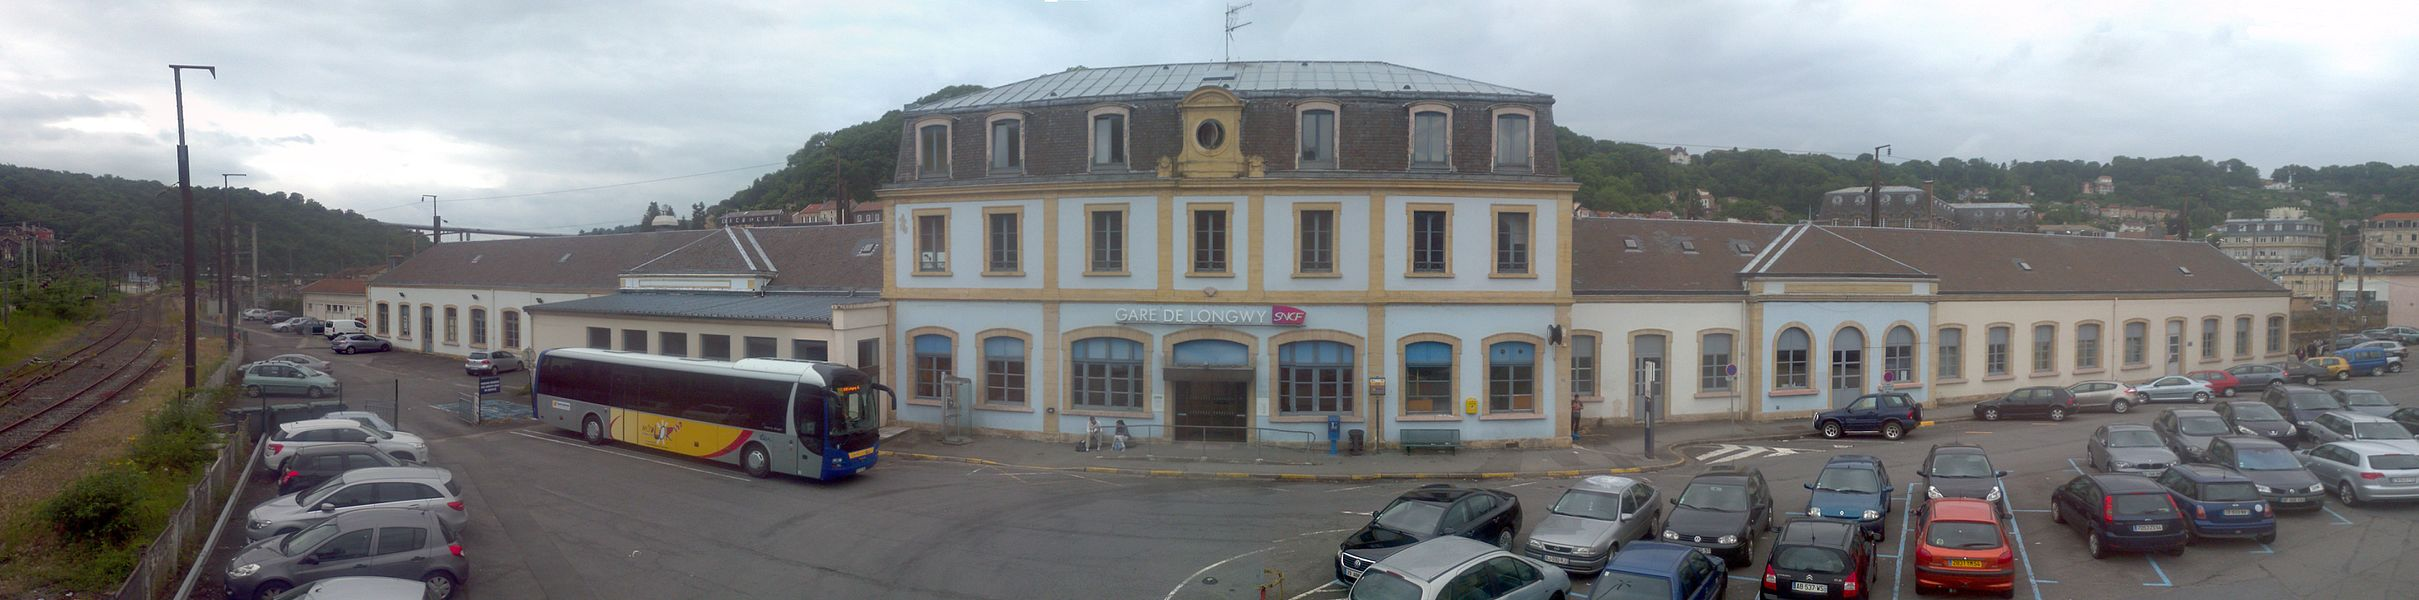 Bahnhofvorplatz Longwy, Lothringen